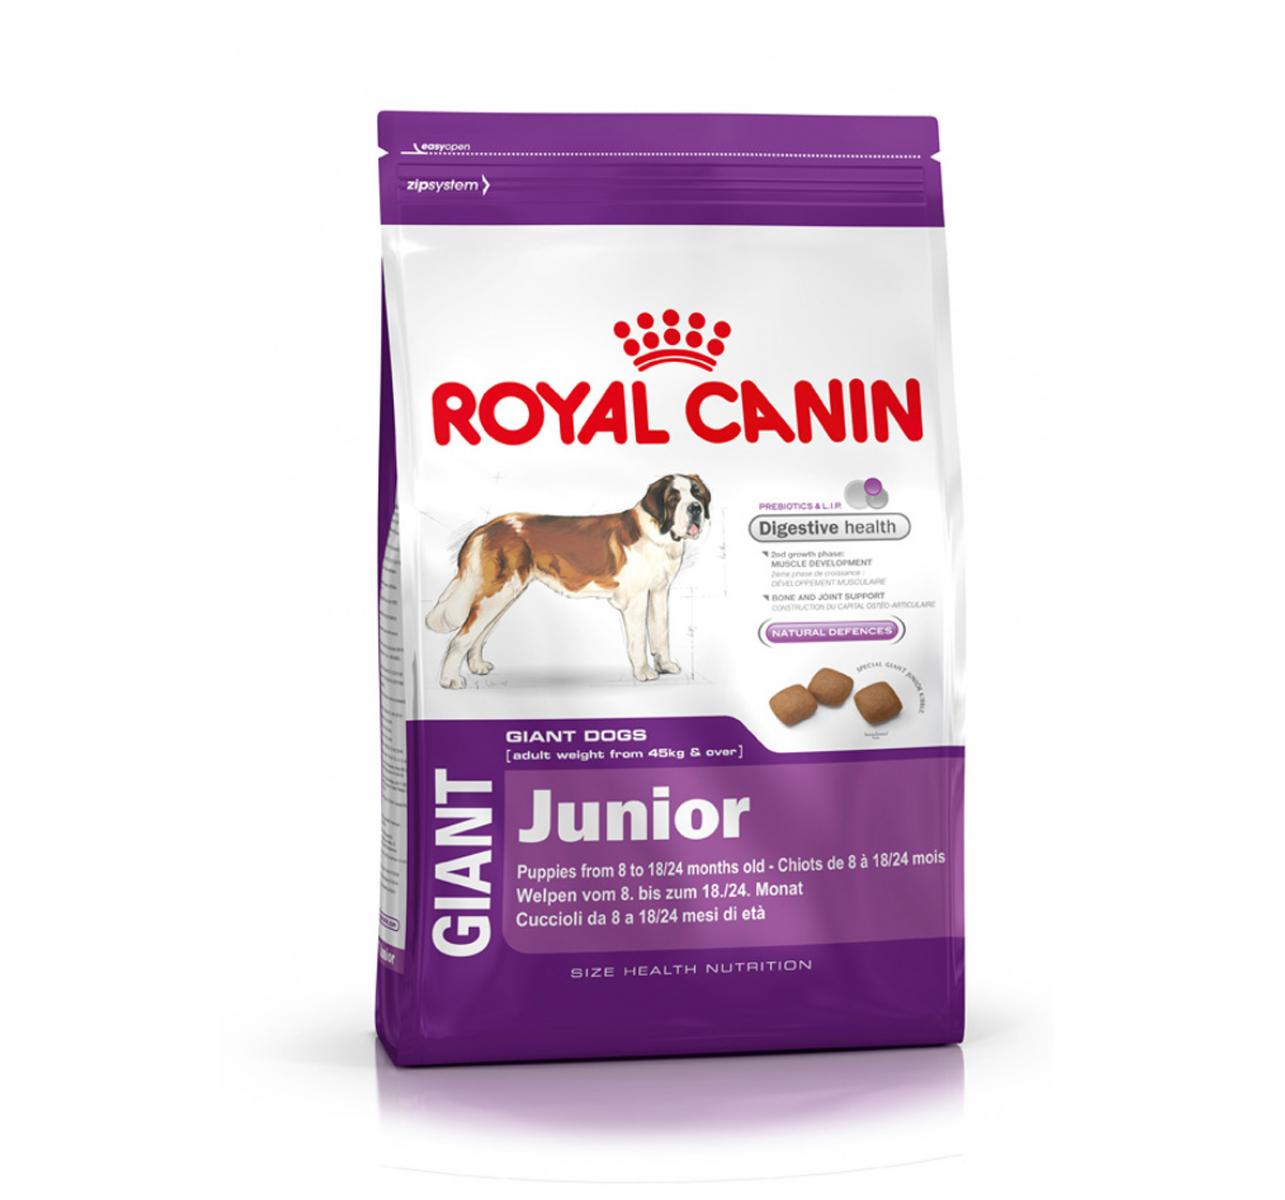 Royal Canin Giant Junior - 4 Kg